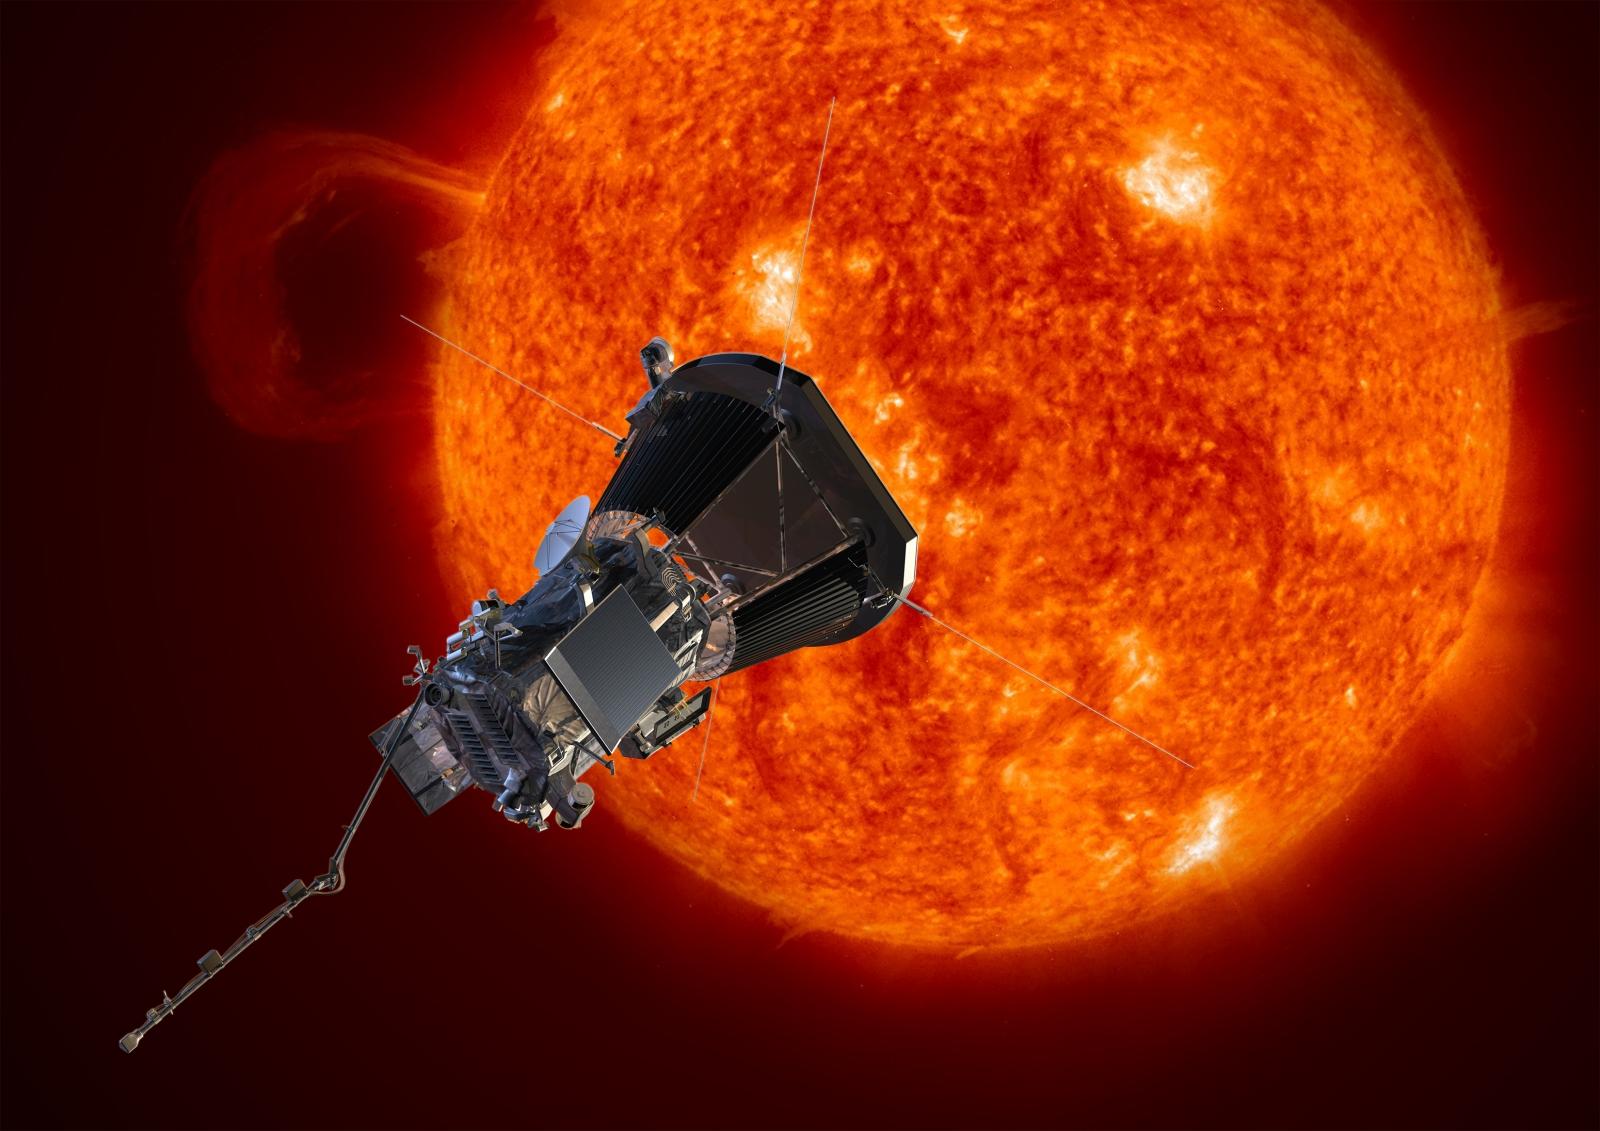 Nasa Solar Probe Plus mission announcement